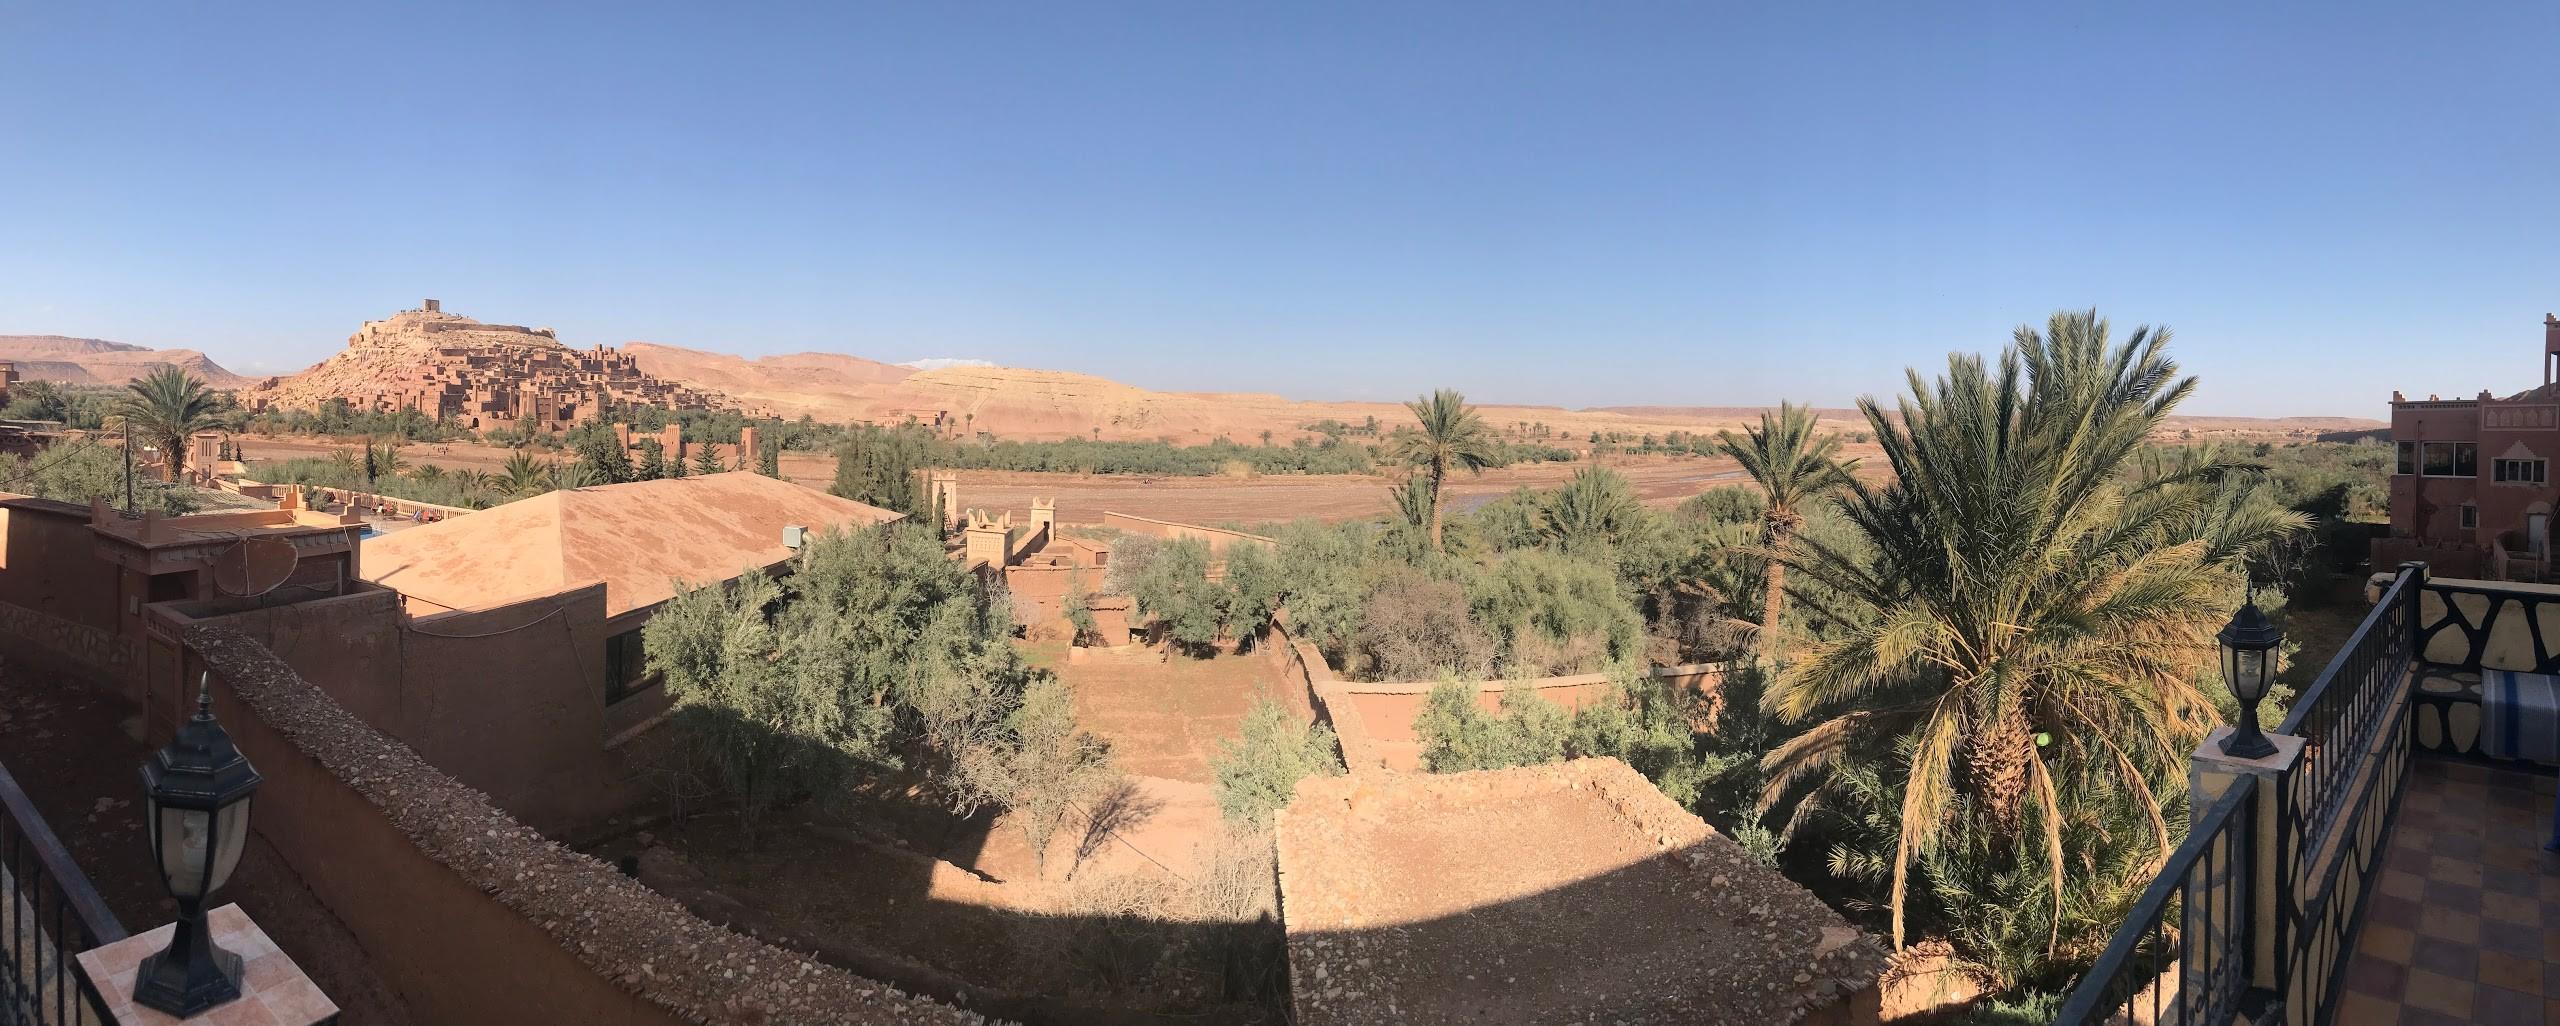 Maroc 41